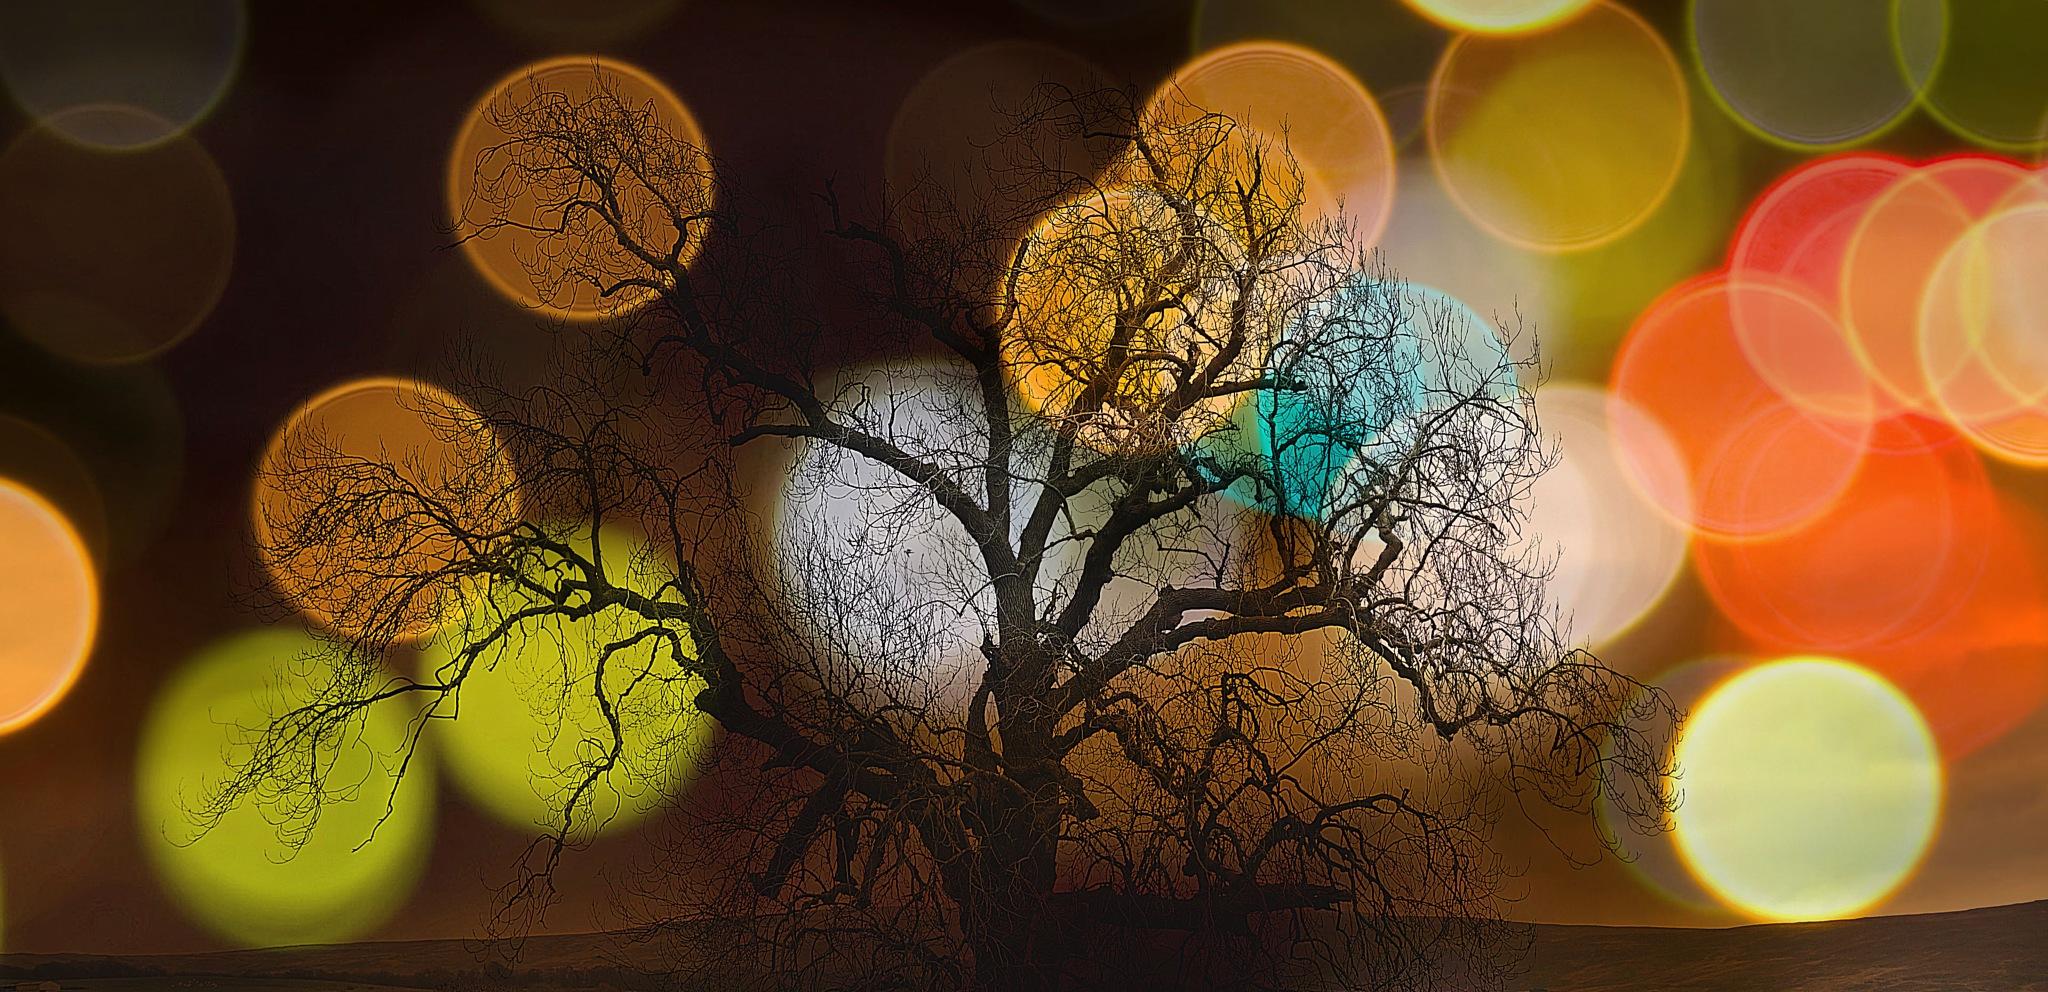 Glare by Geraldine Francis